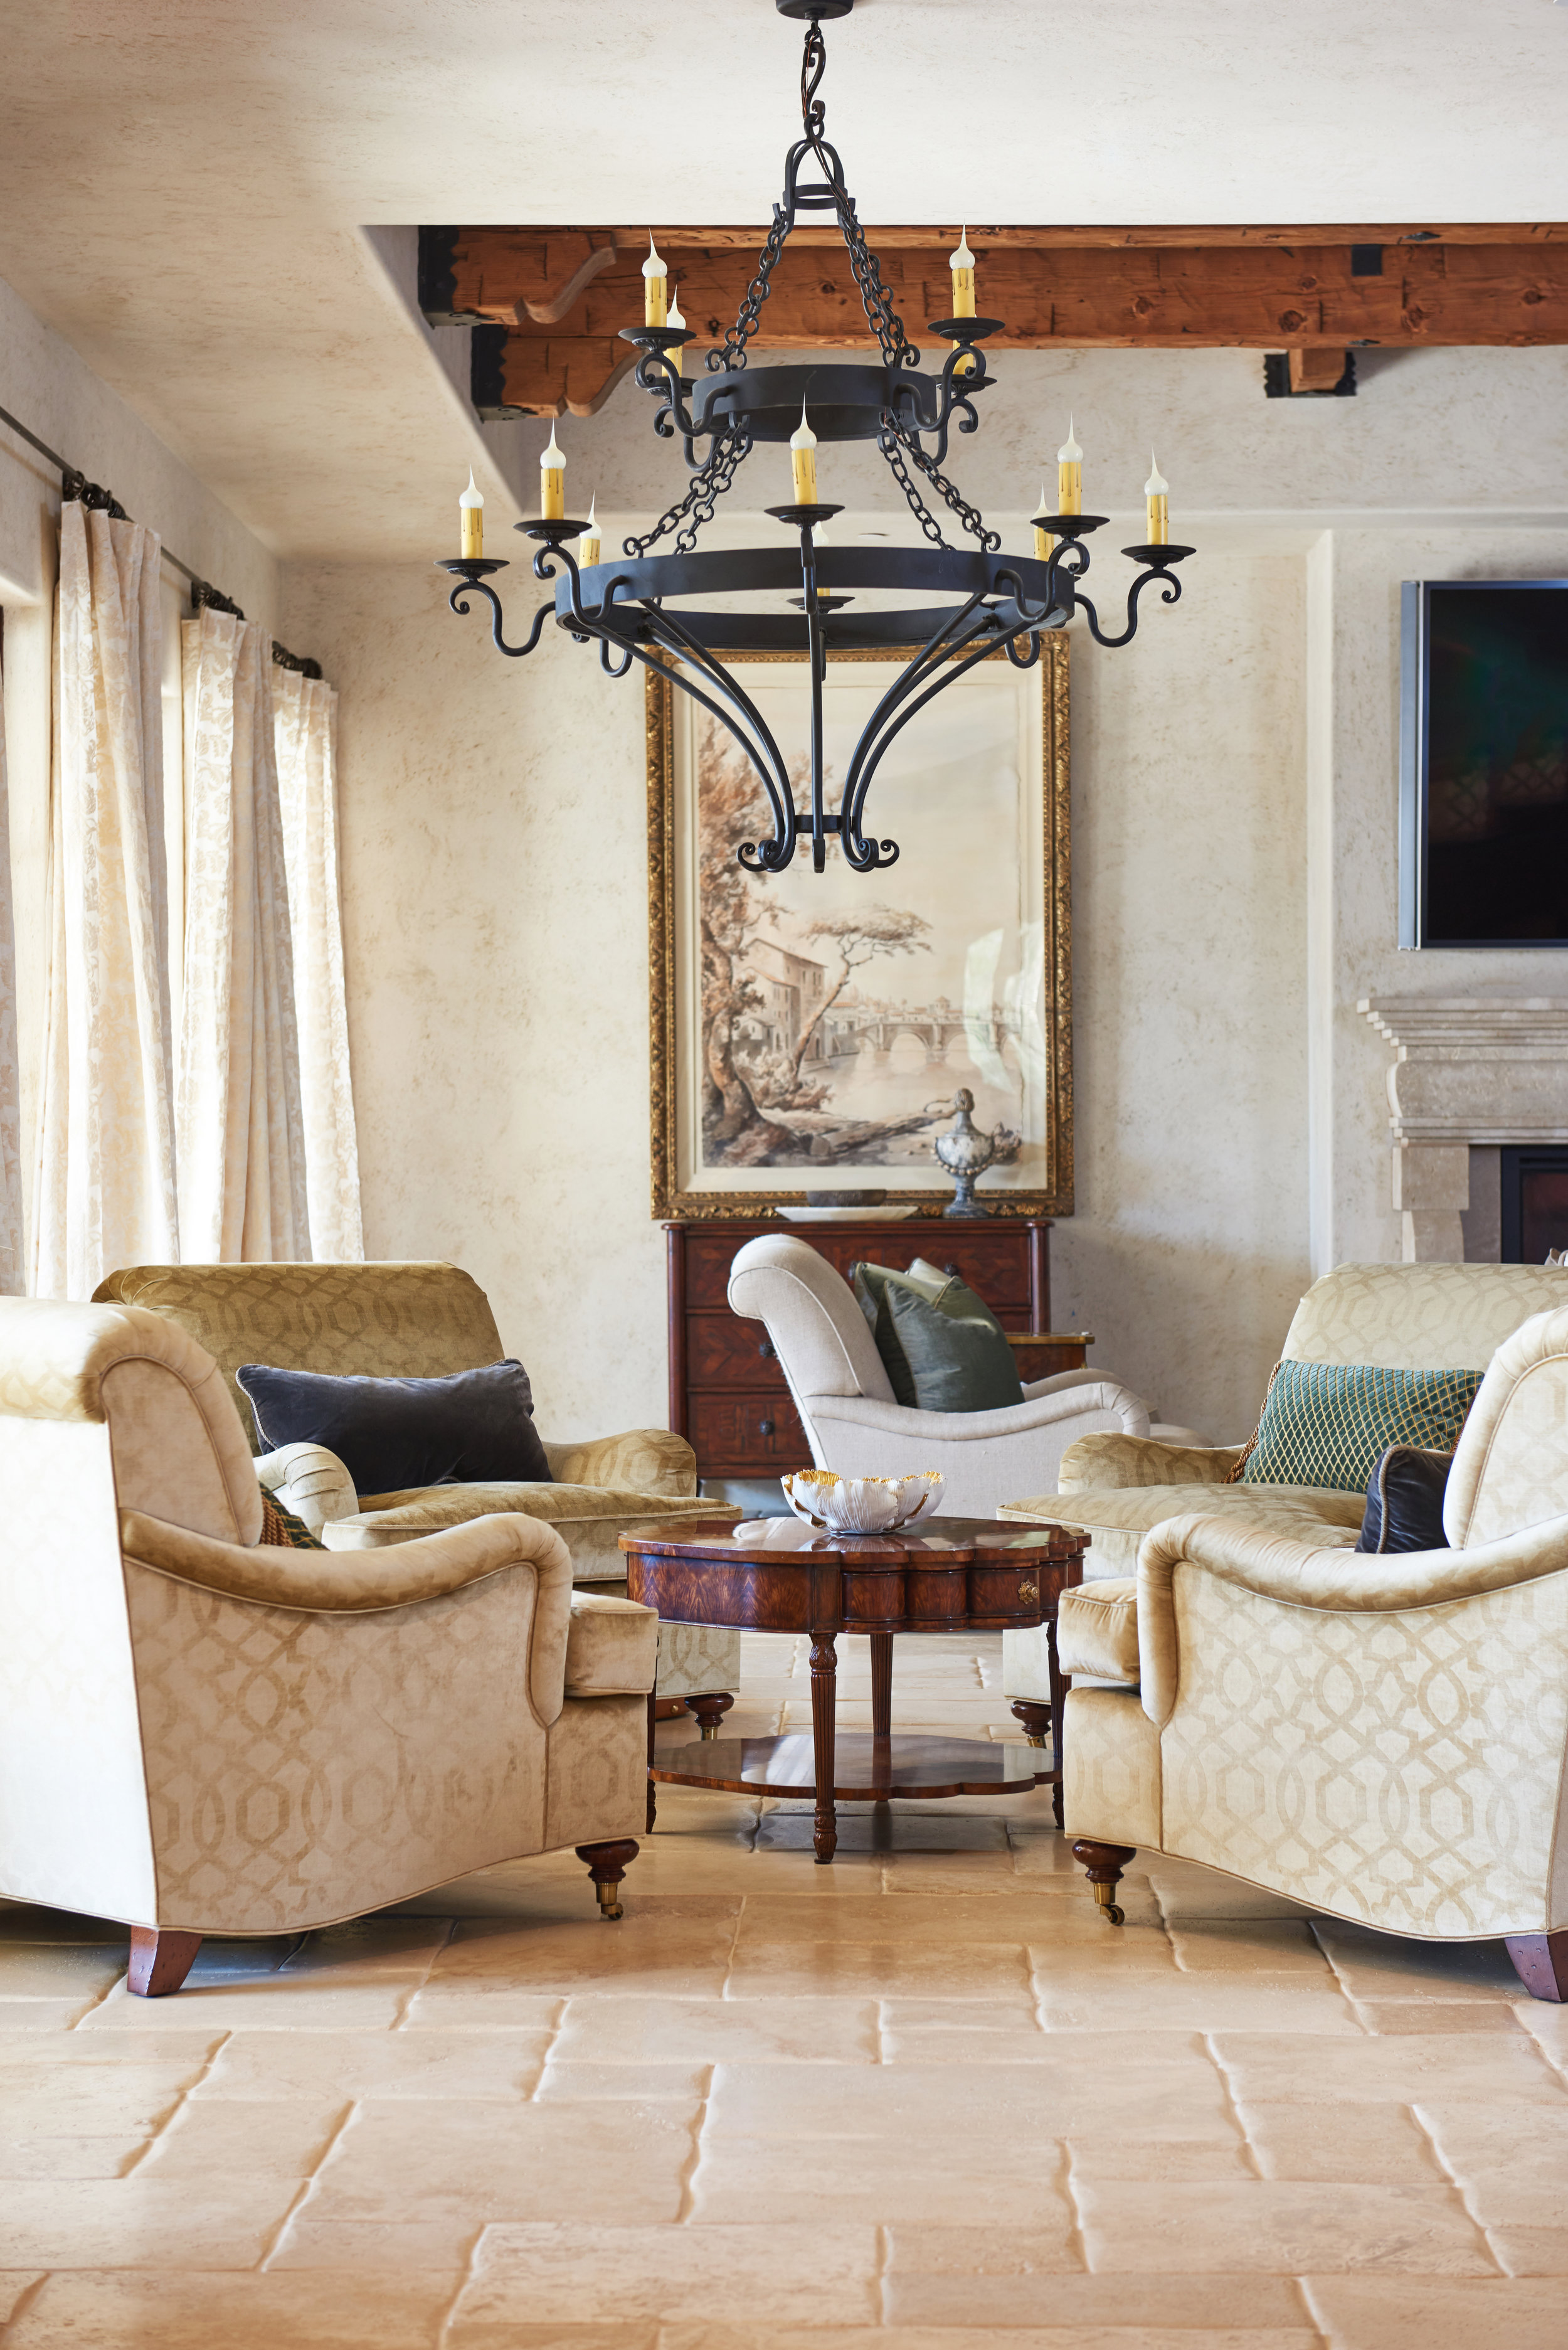 Malachowski Residence - Kelly Ferm, Inc.